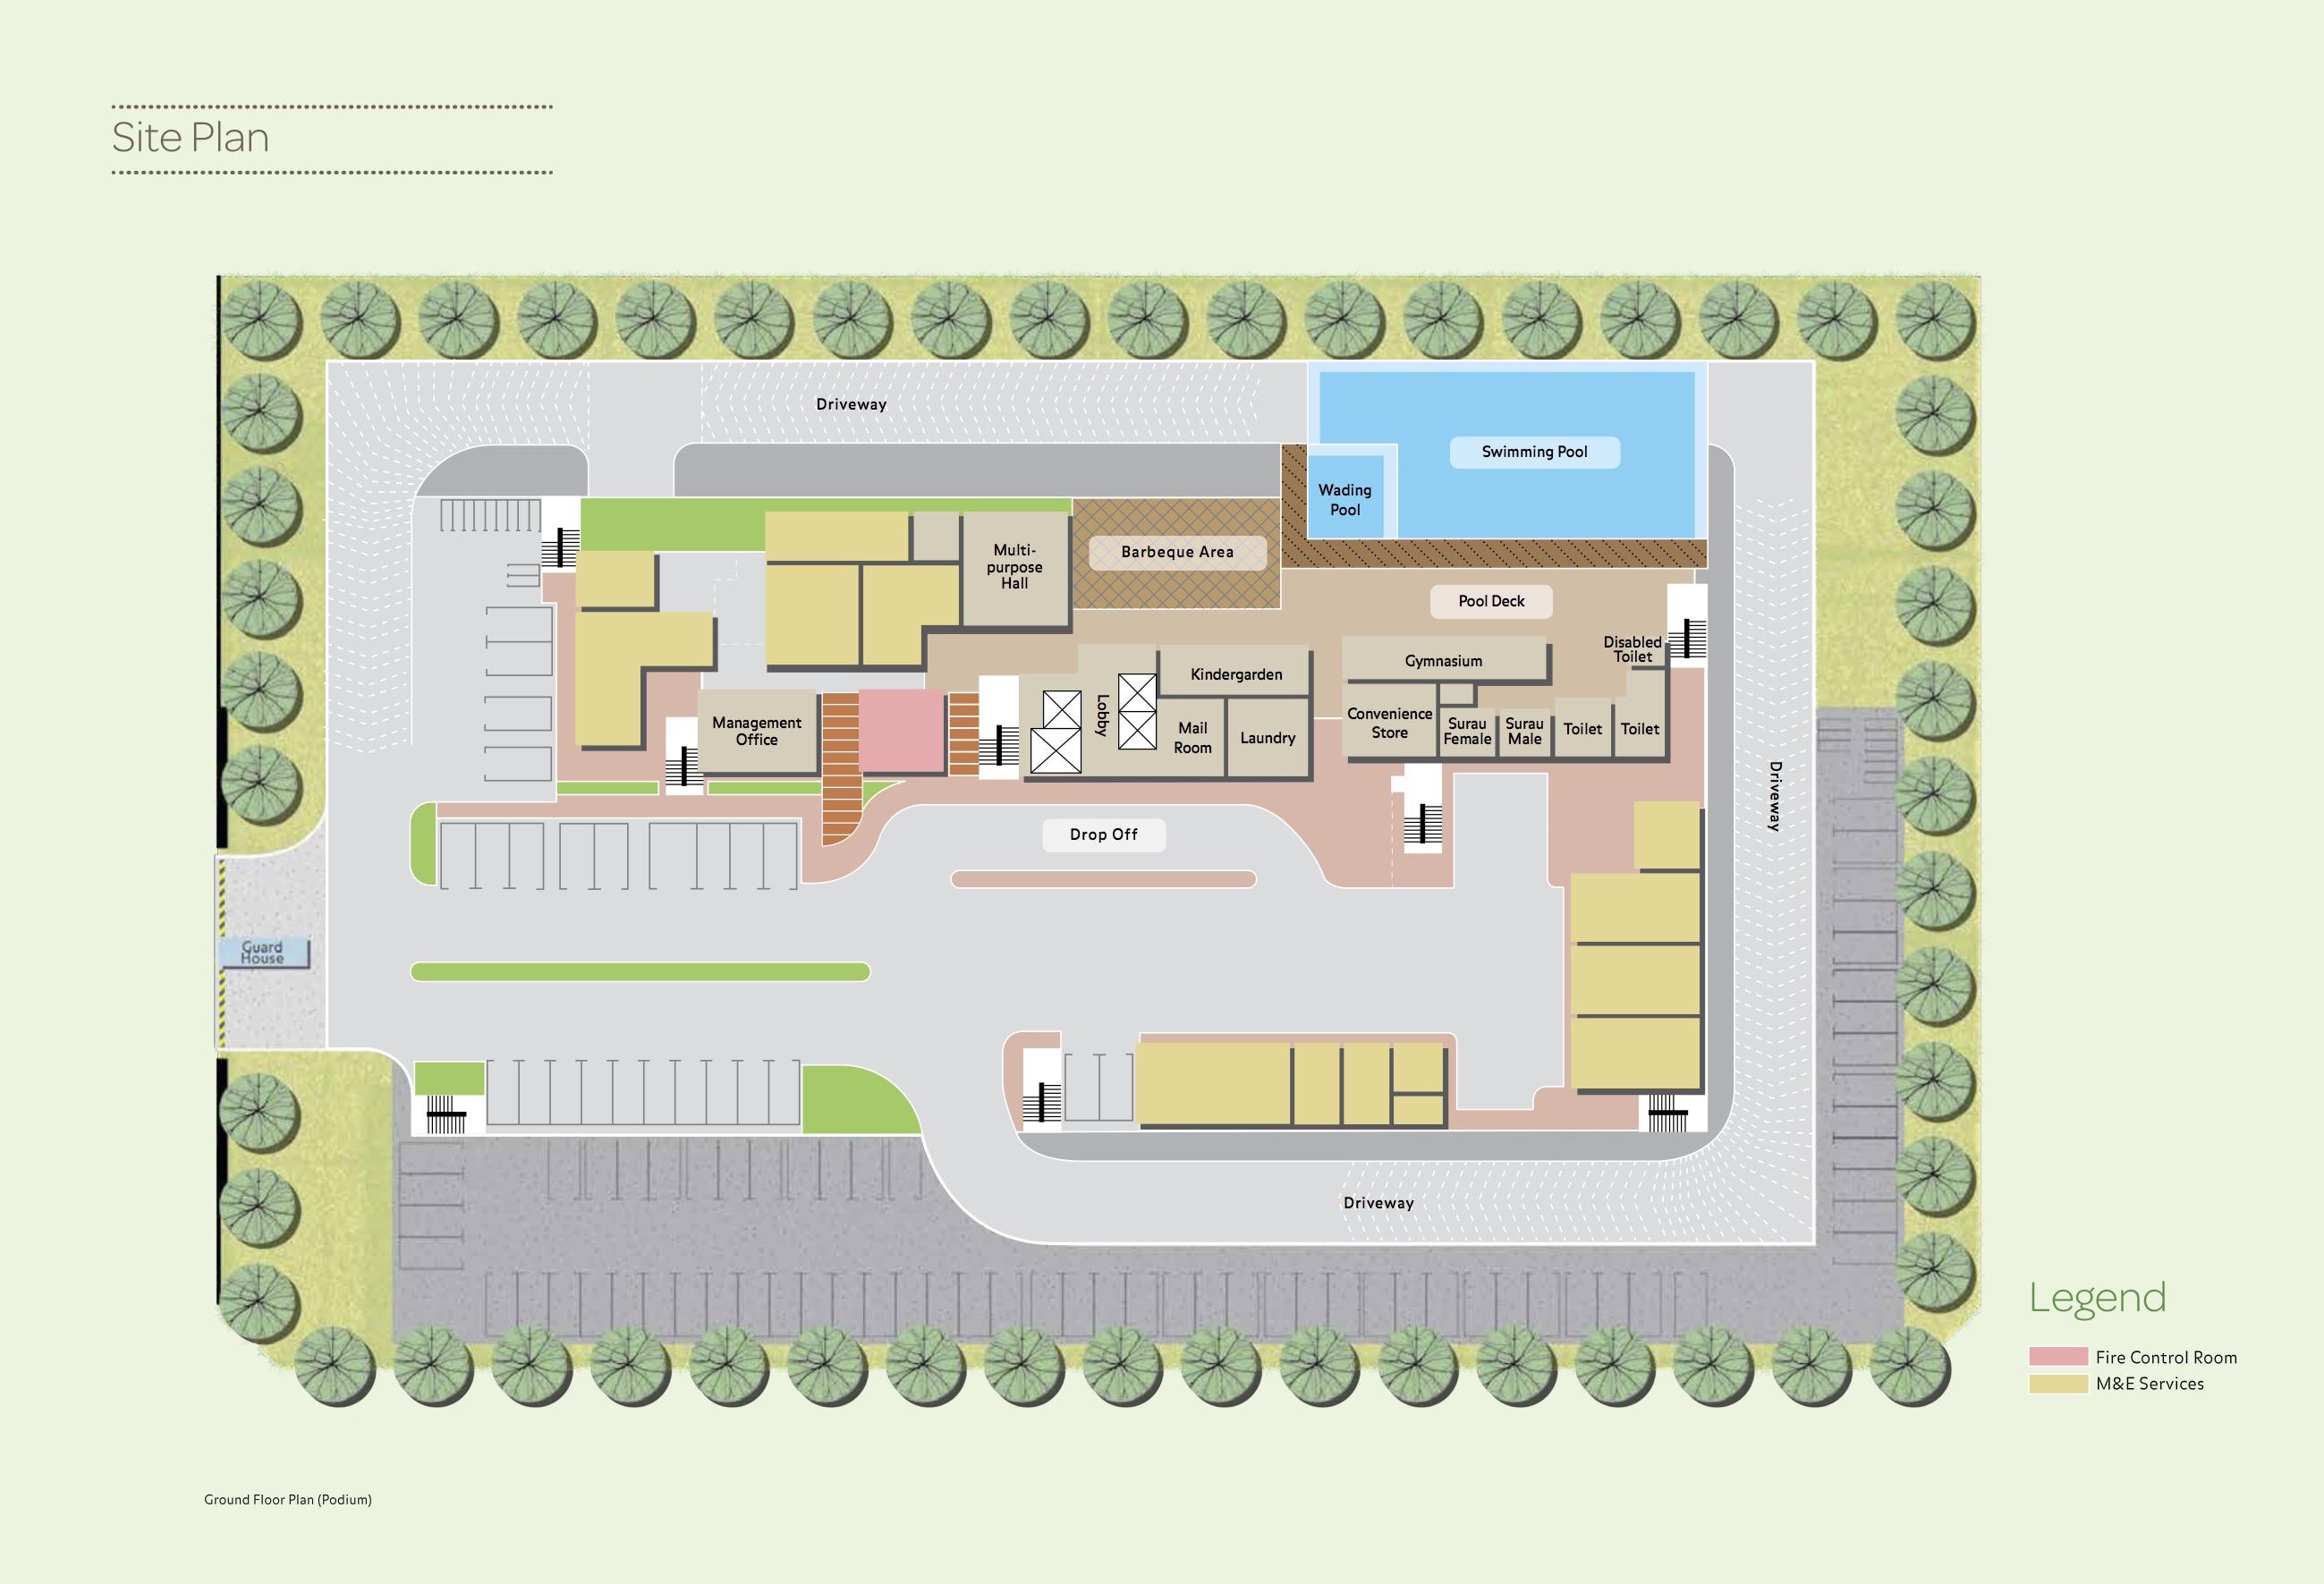 Site Plan of Vista Mahogani